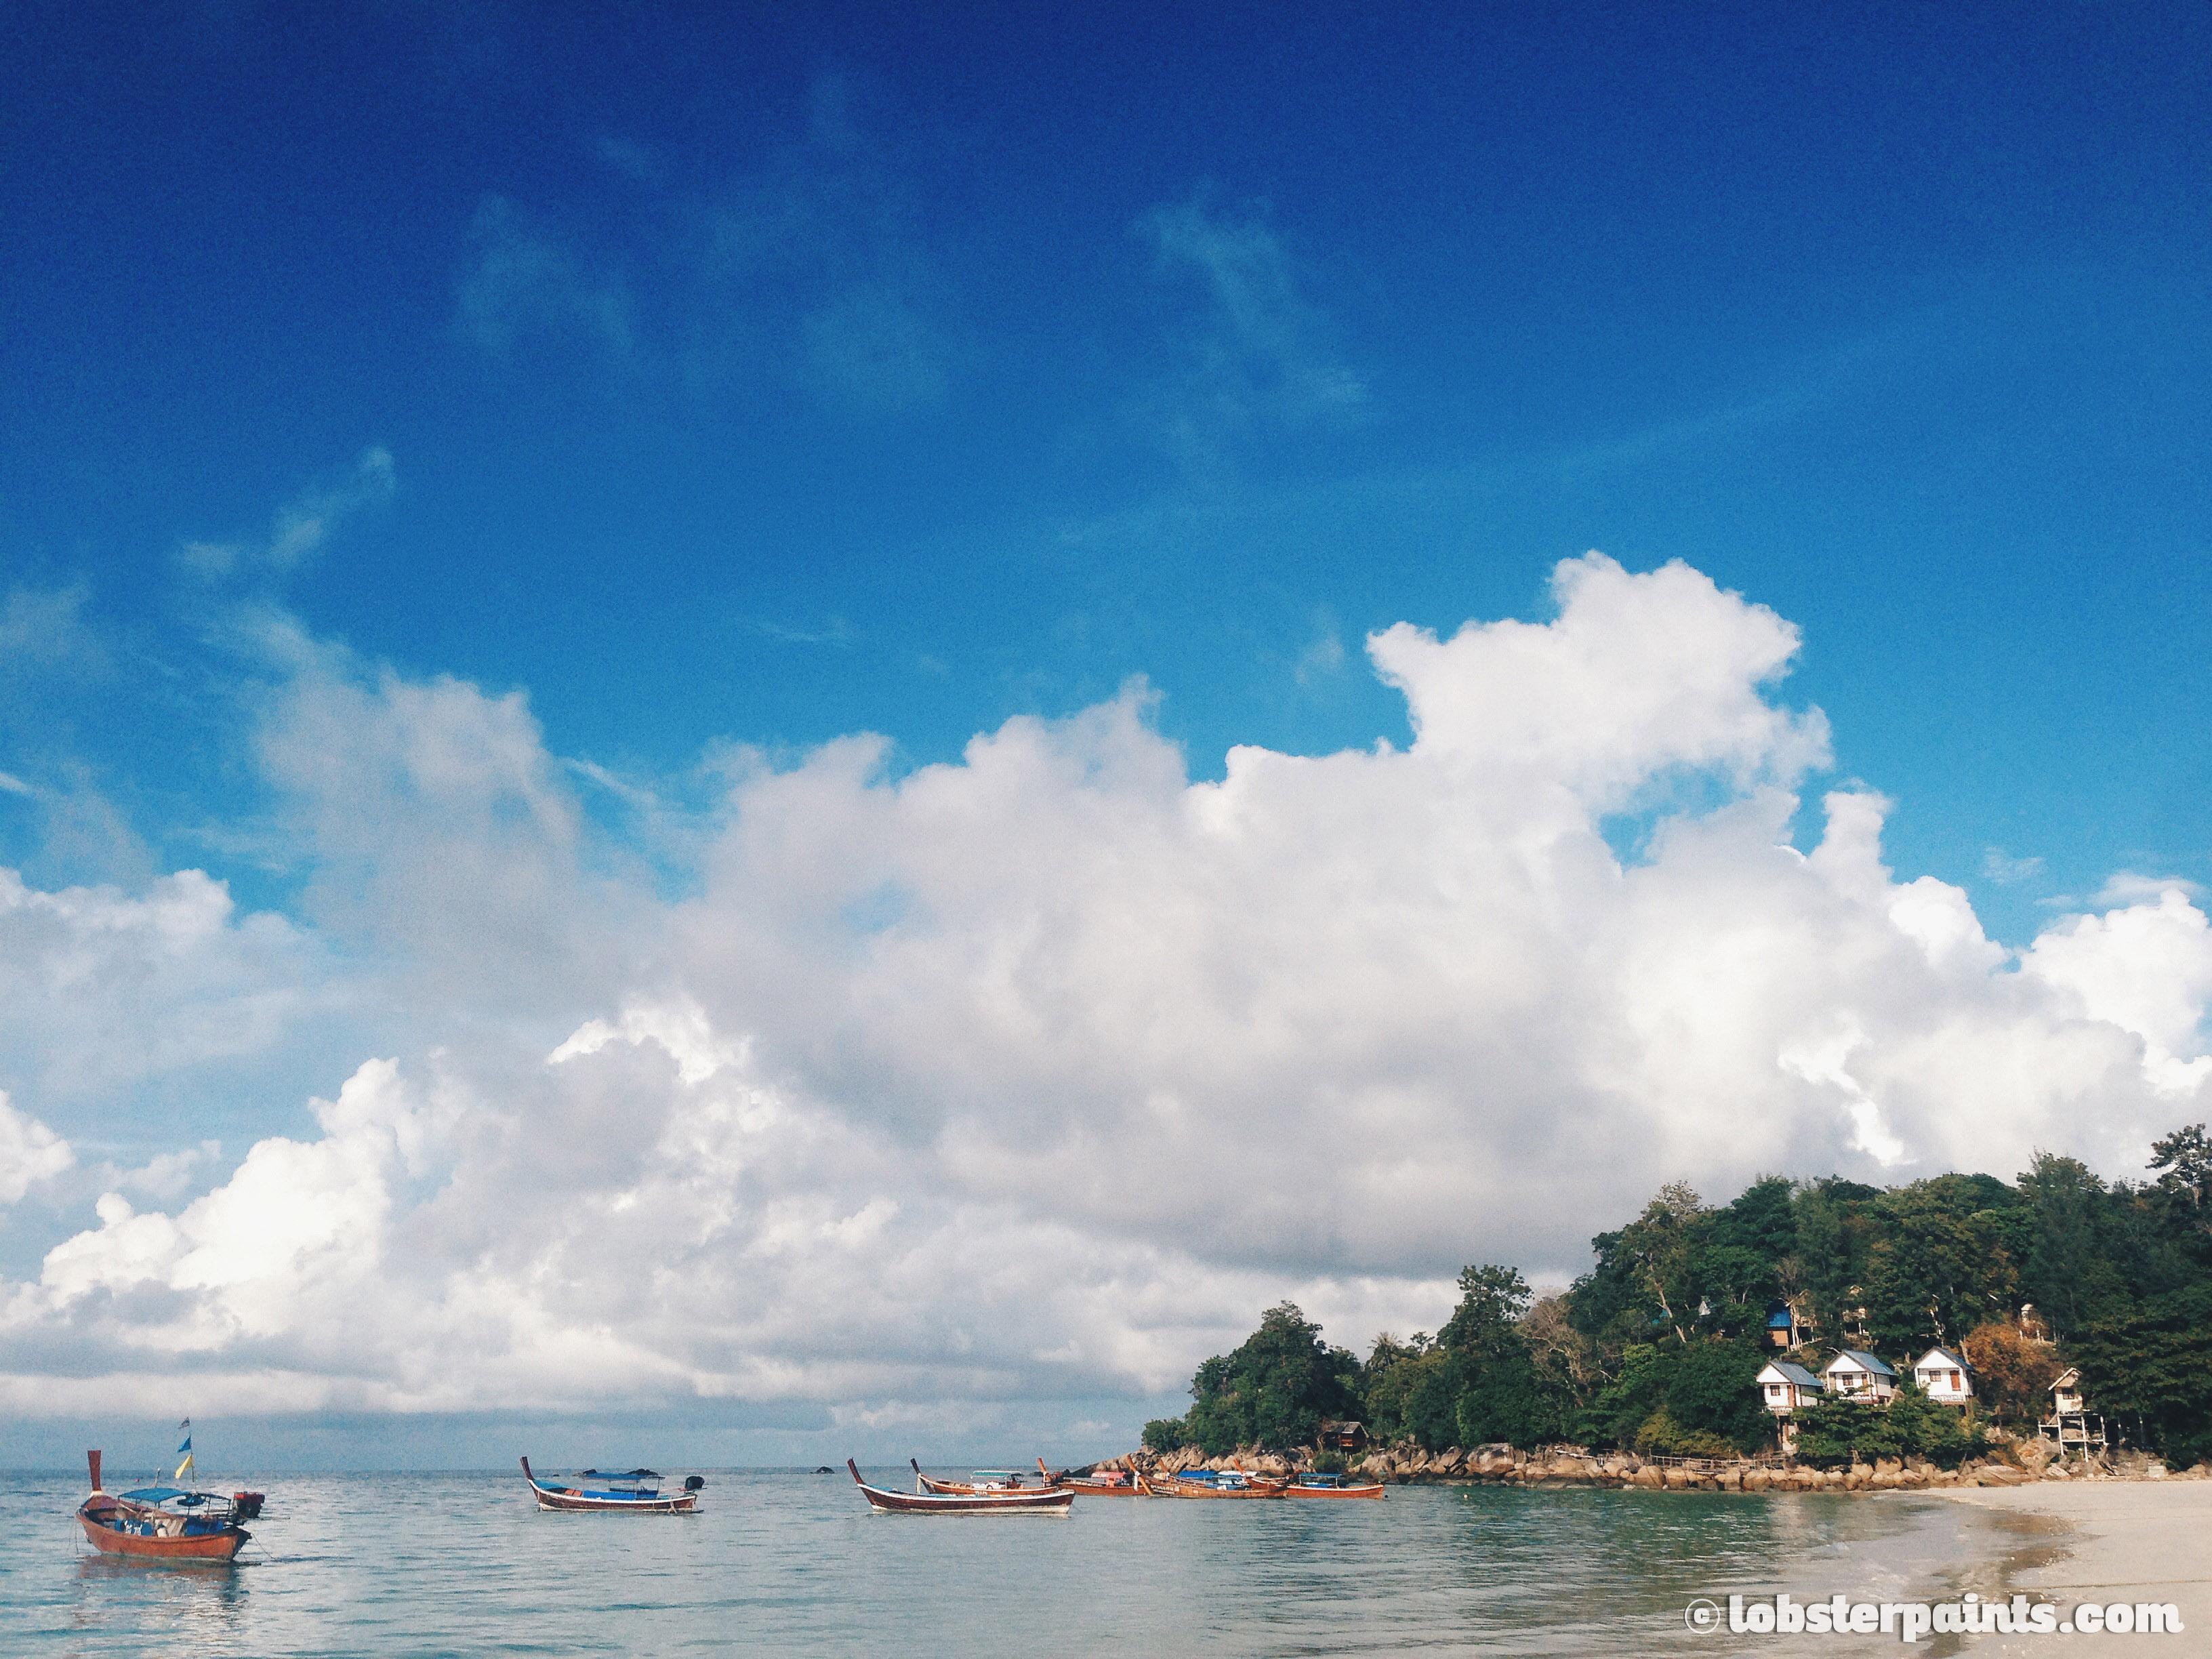 Pattaya Beach | Koh Lipe, Thailand